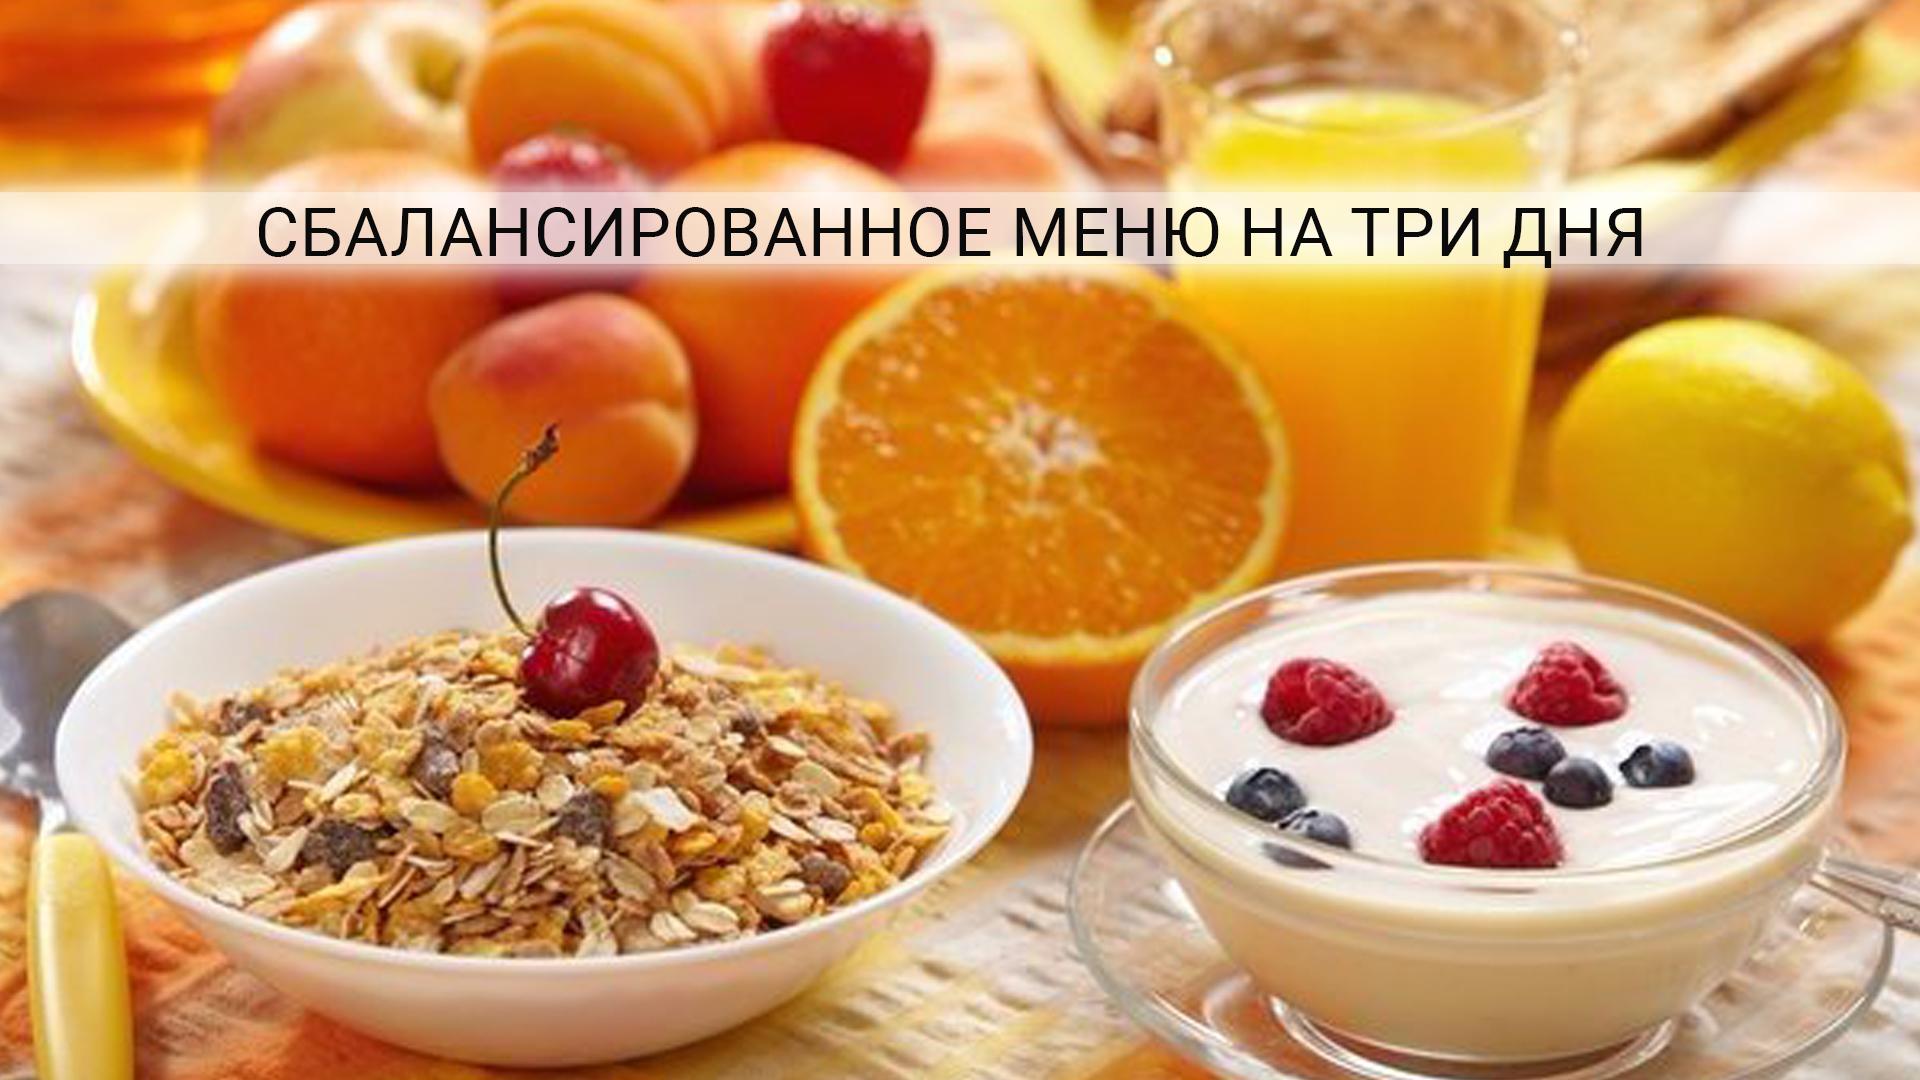 http://snianna.ru/wp-content/uploads/2017/12/Pravilnoe-pitanie-1.jpg